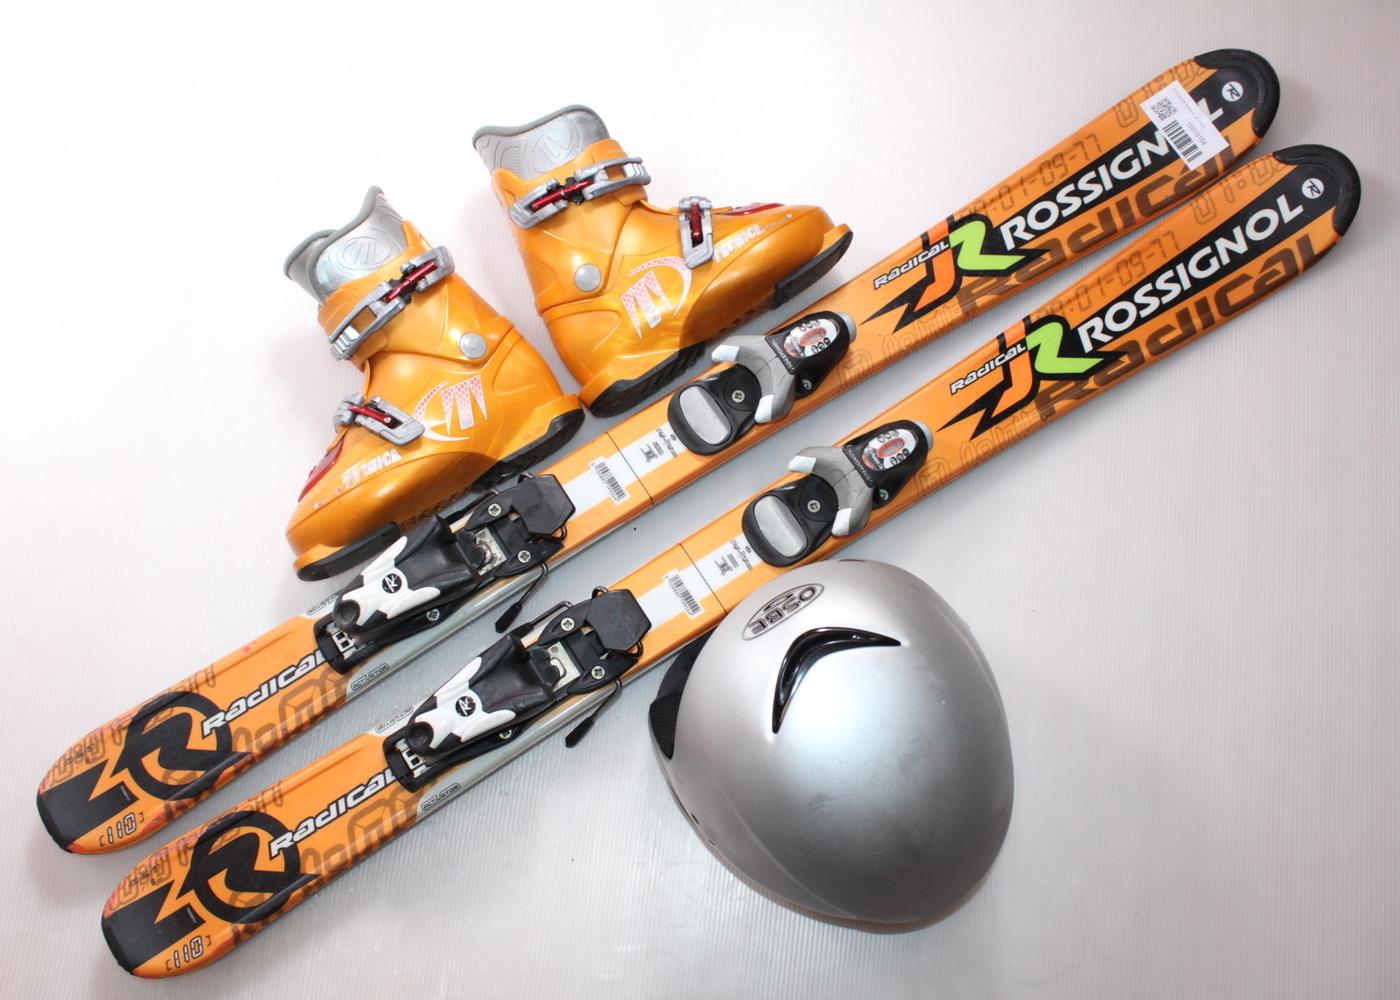 Dětské lyže ROSSIGNOL RADICAL JR 110 cm + lyžáky  31EU + helma